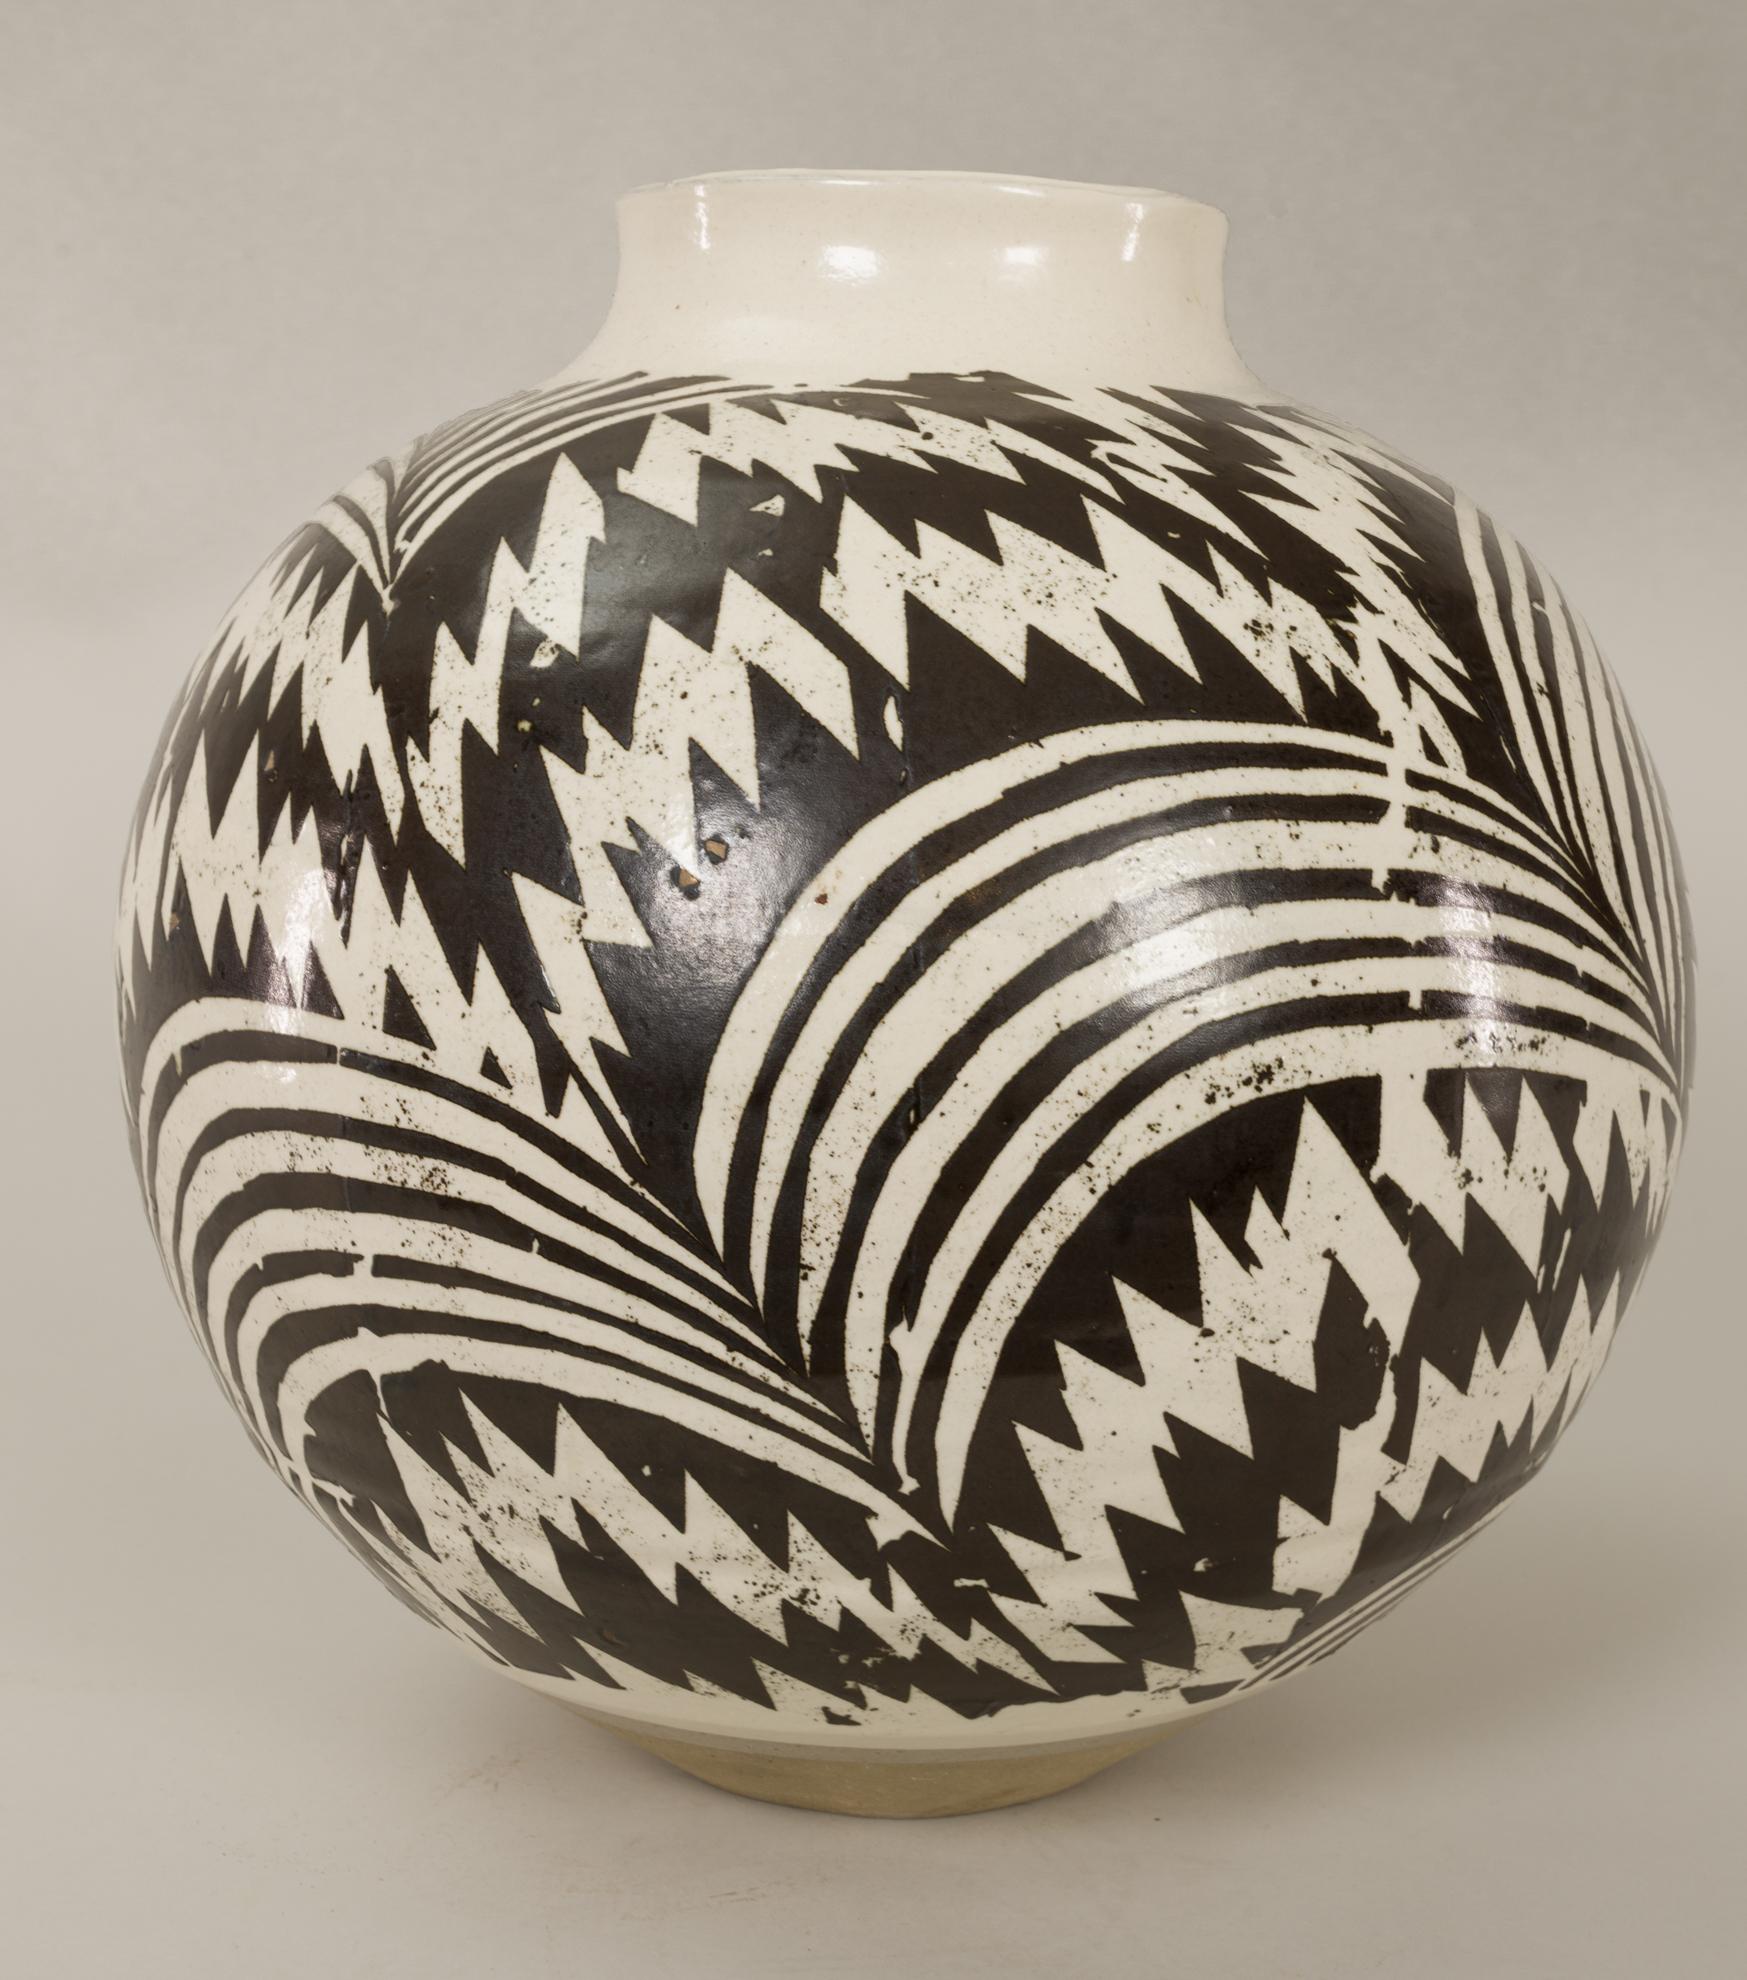 Japanese art, Japanese antique, Japanese ceramic, Japanese vase, modern Japanese vase, modern Japanese art